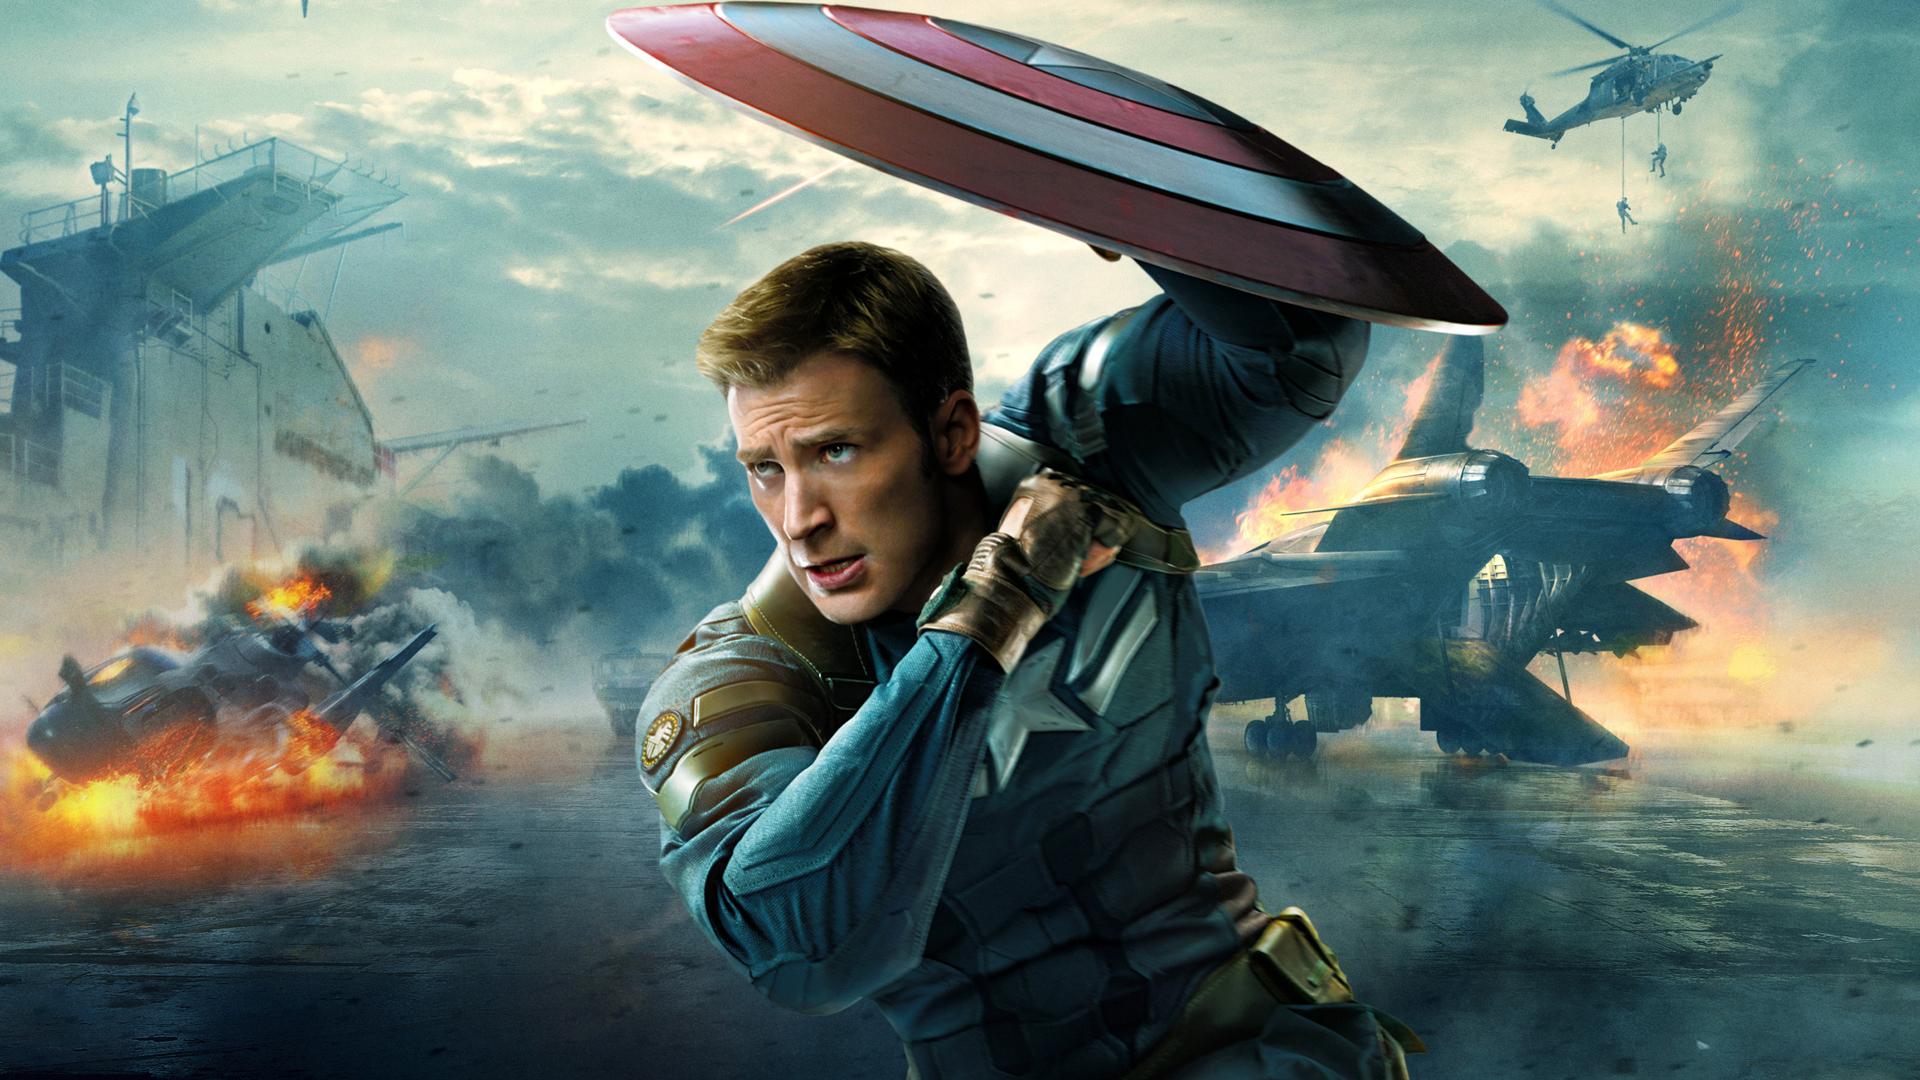 Captain america the winter soldier steve rogers chris evans marvel 1920x1080